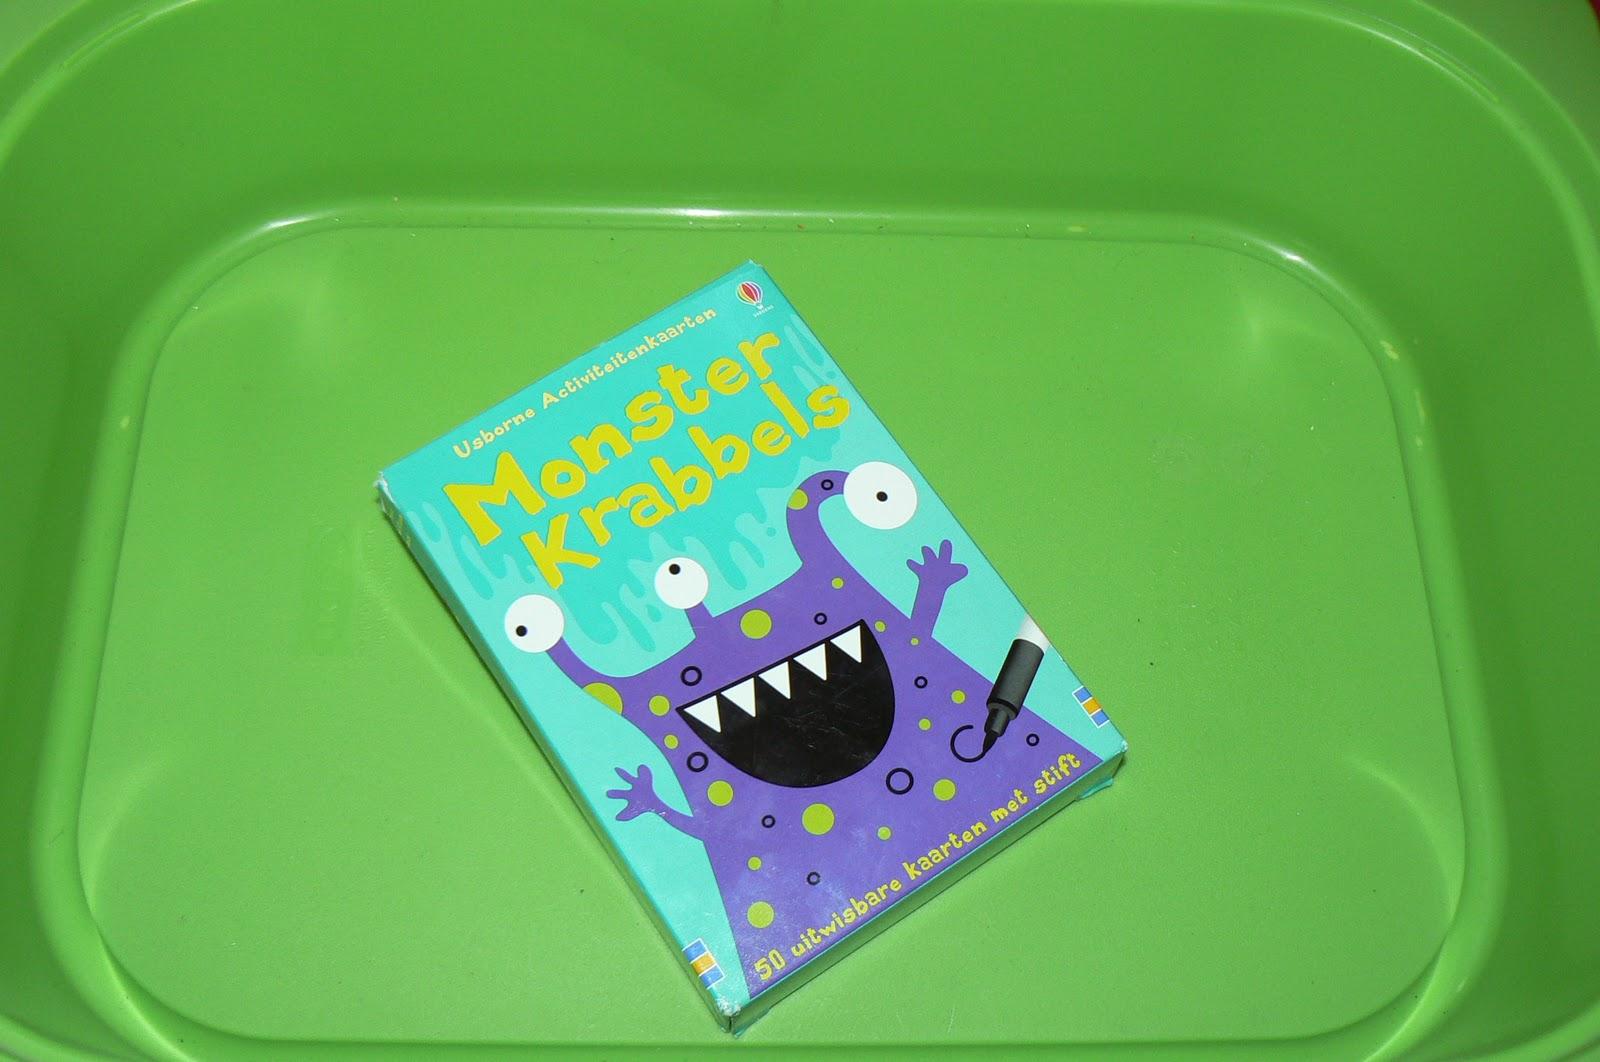 Orca Observar Recordar Crecer Y Aprender Libreta De Dibujo: Orca: Observar, Recordar, Crecer Y Aprender: Miércoles